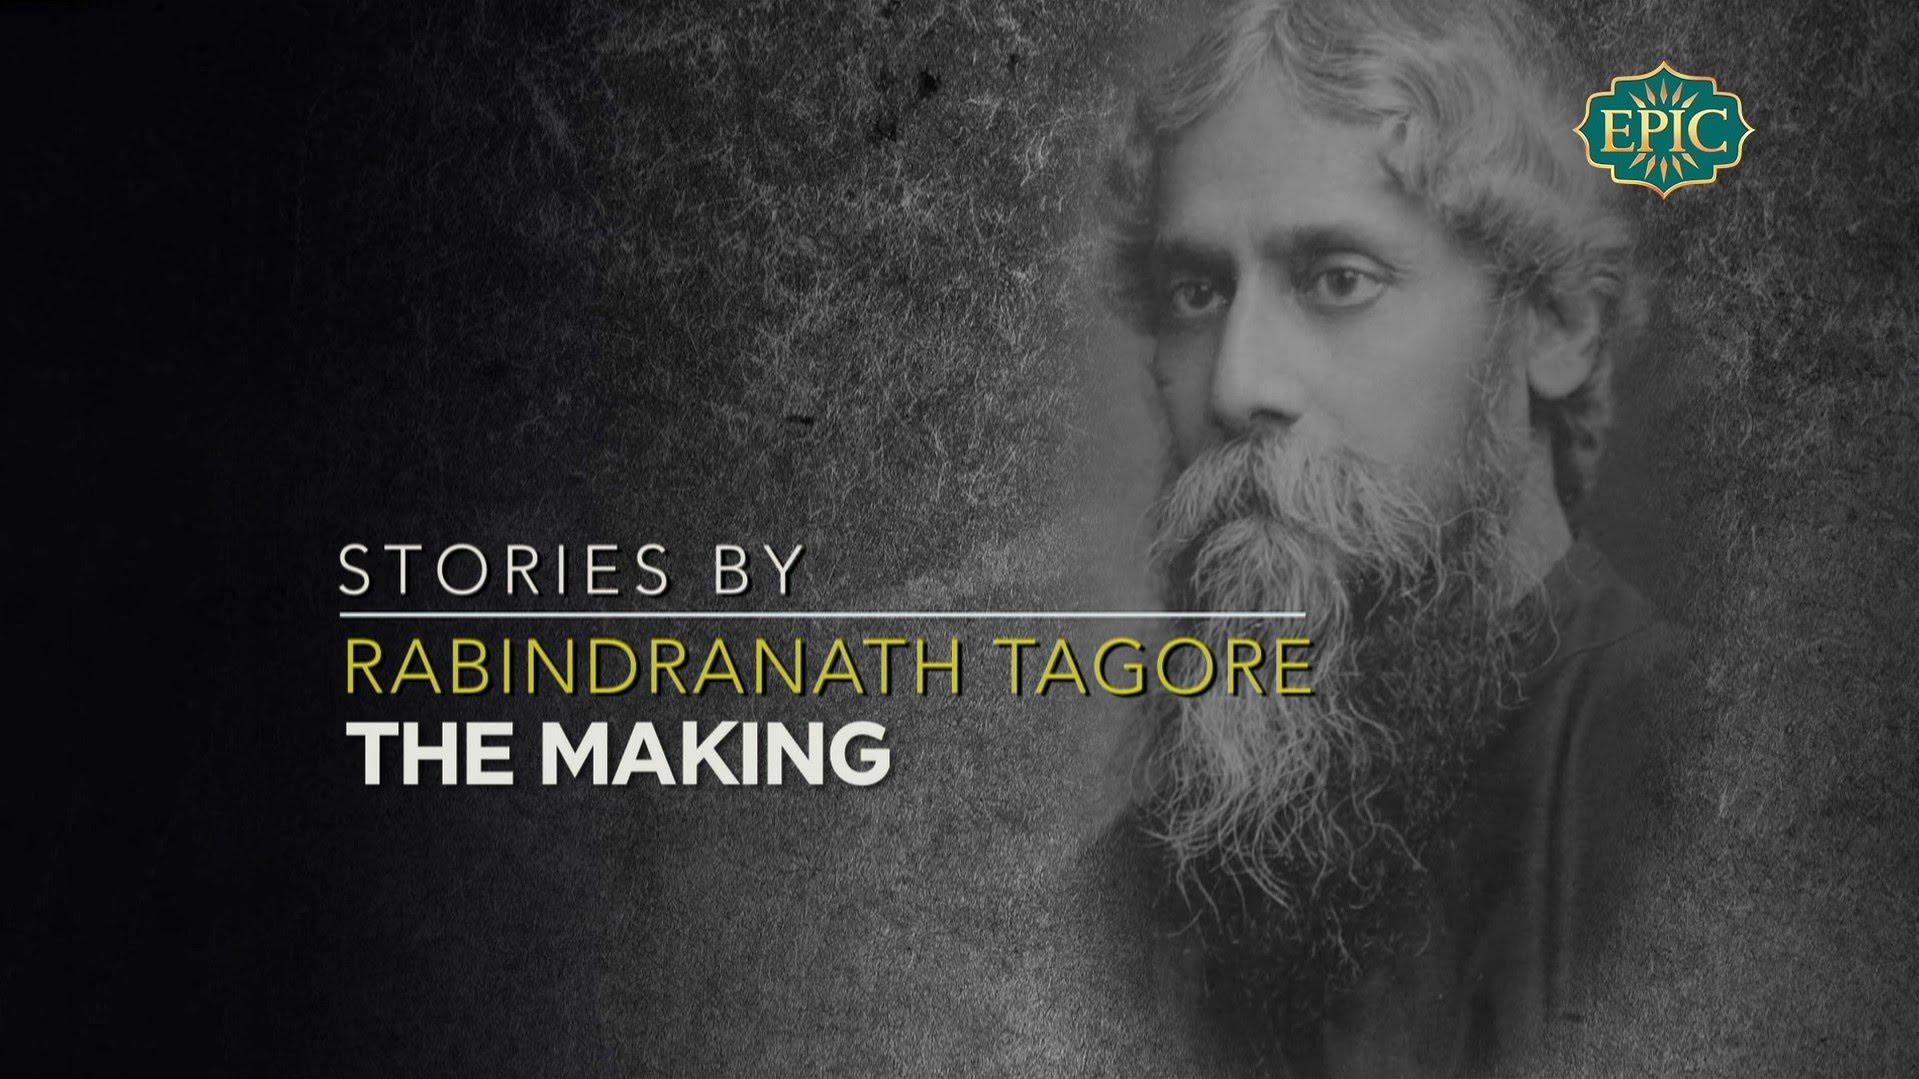 Stories by Rabindranath Tagore (TV Series 2015) - IMDb